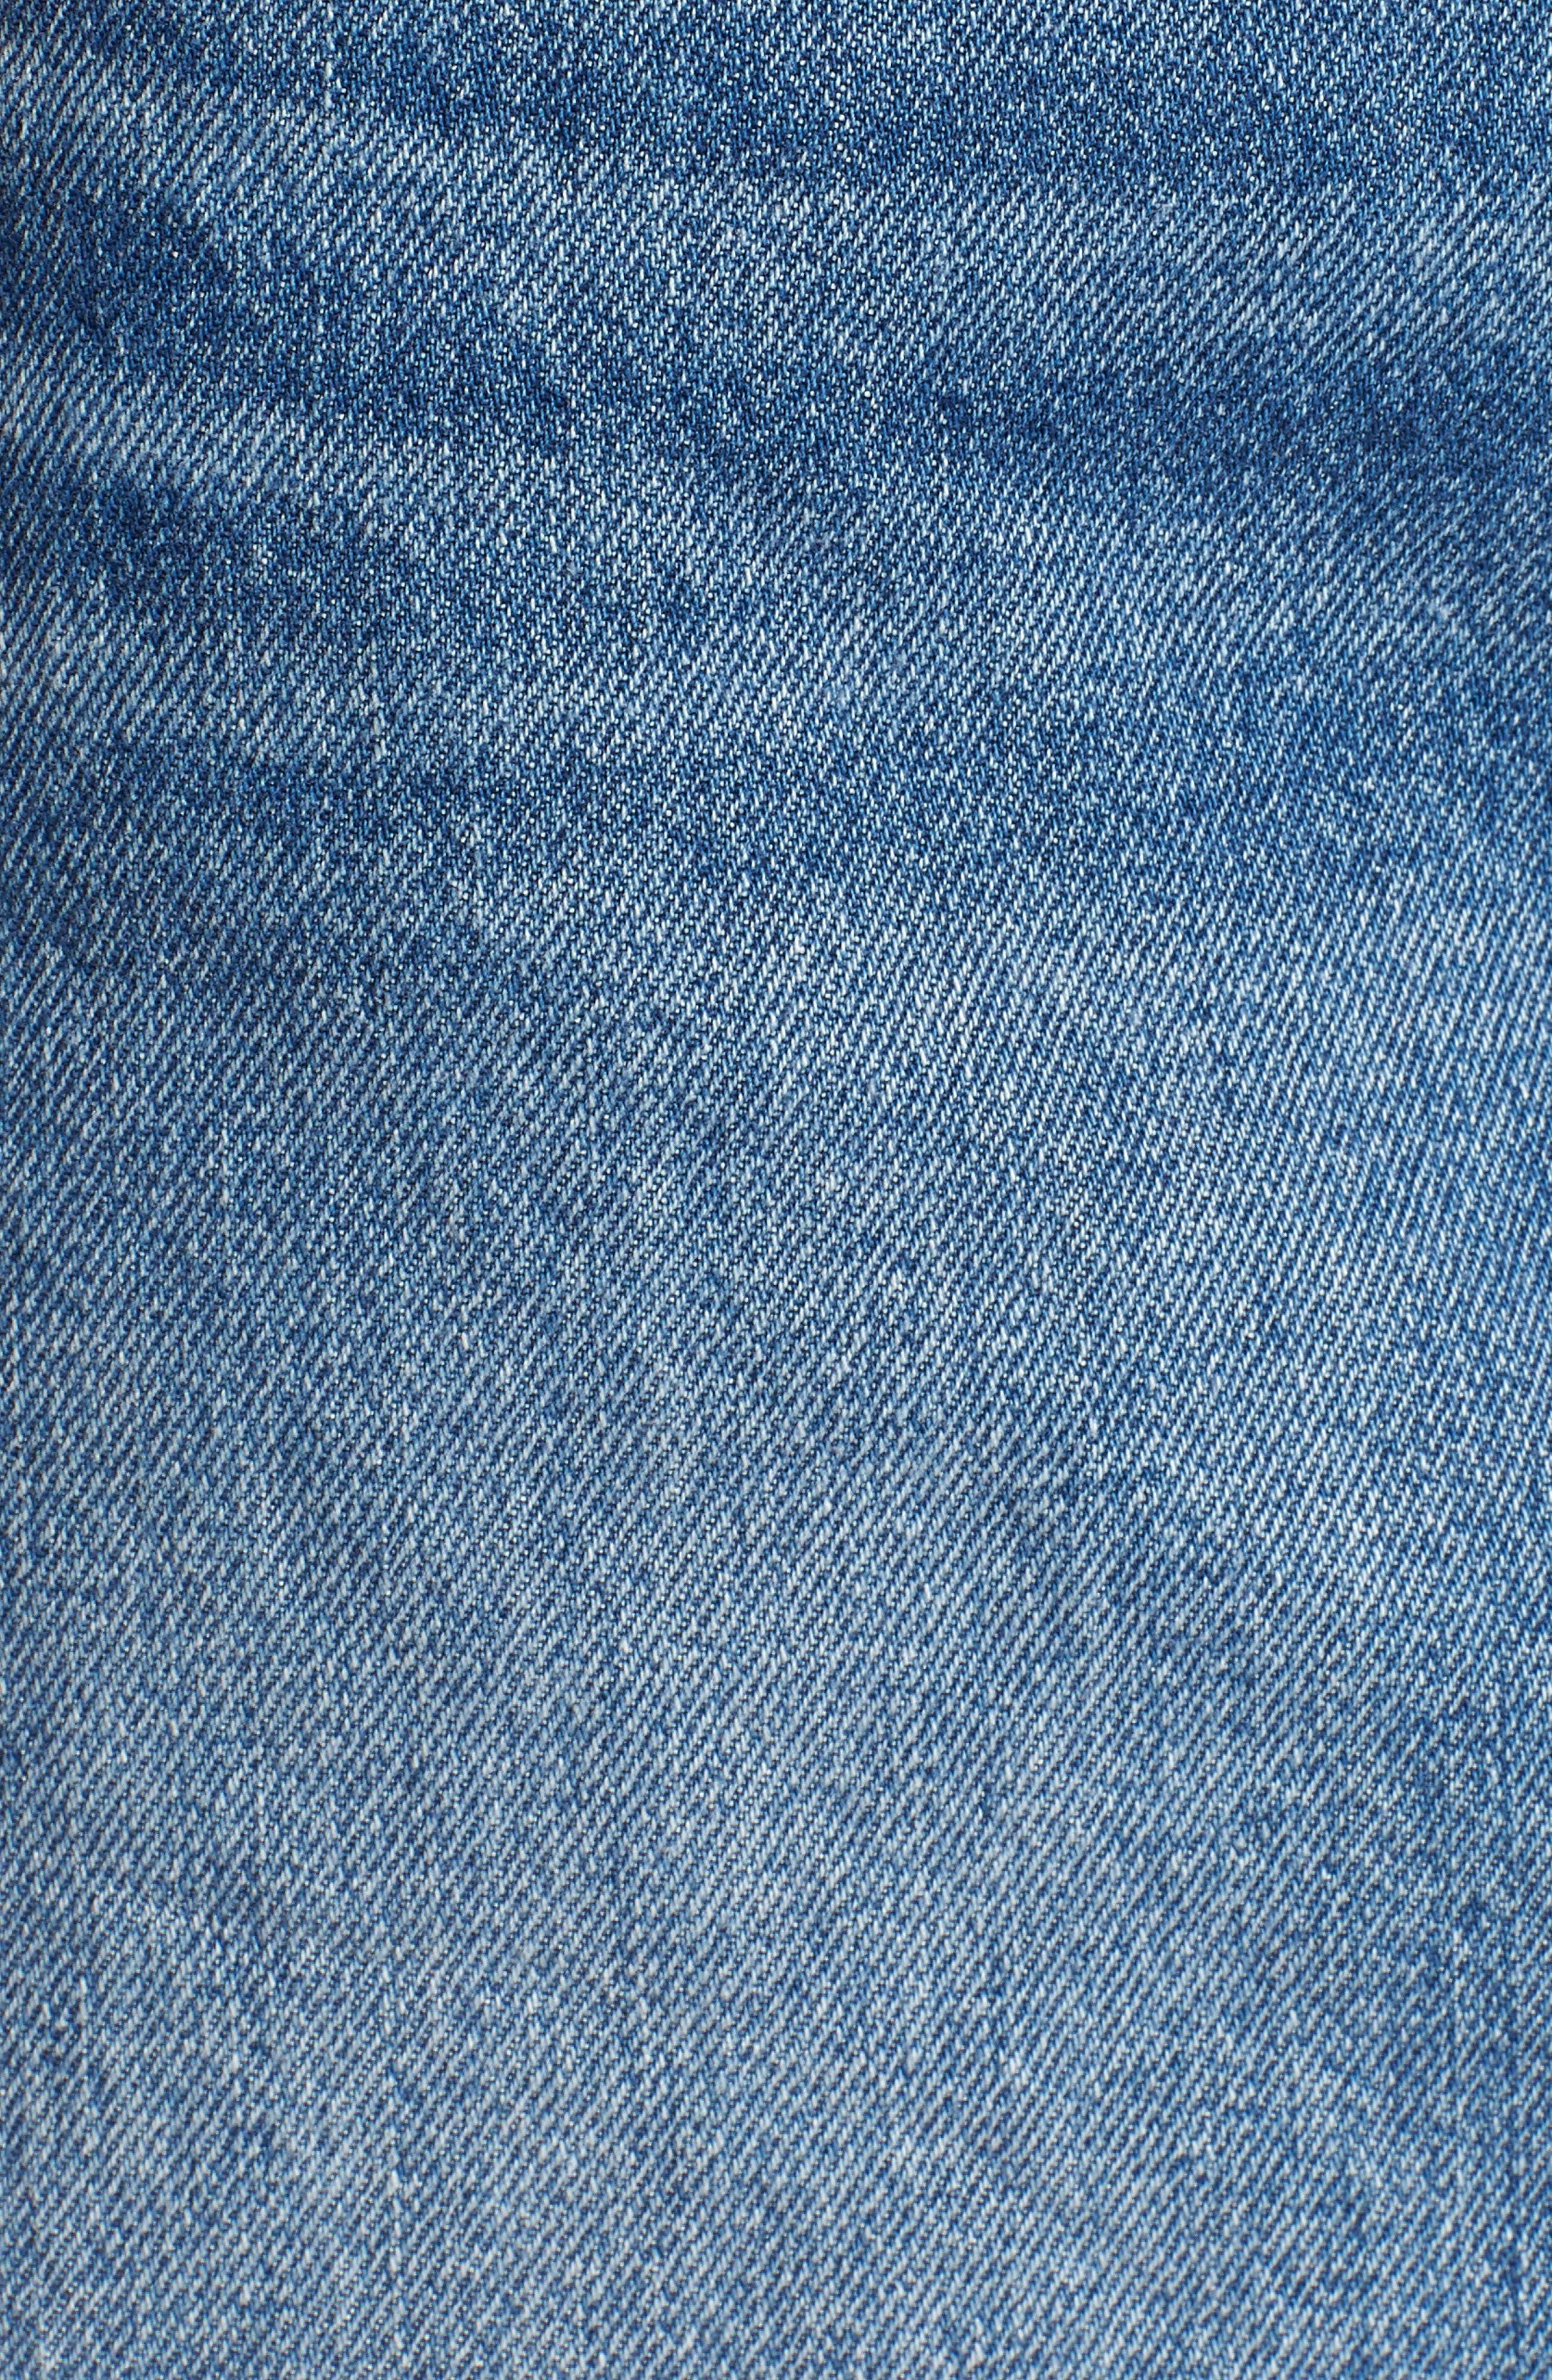 ,                             Deconstructed Denim Skirt,                             Alternate thumbnail 6, color,                             MIDDLE MAN